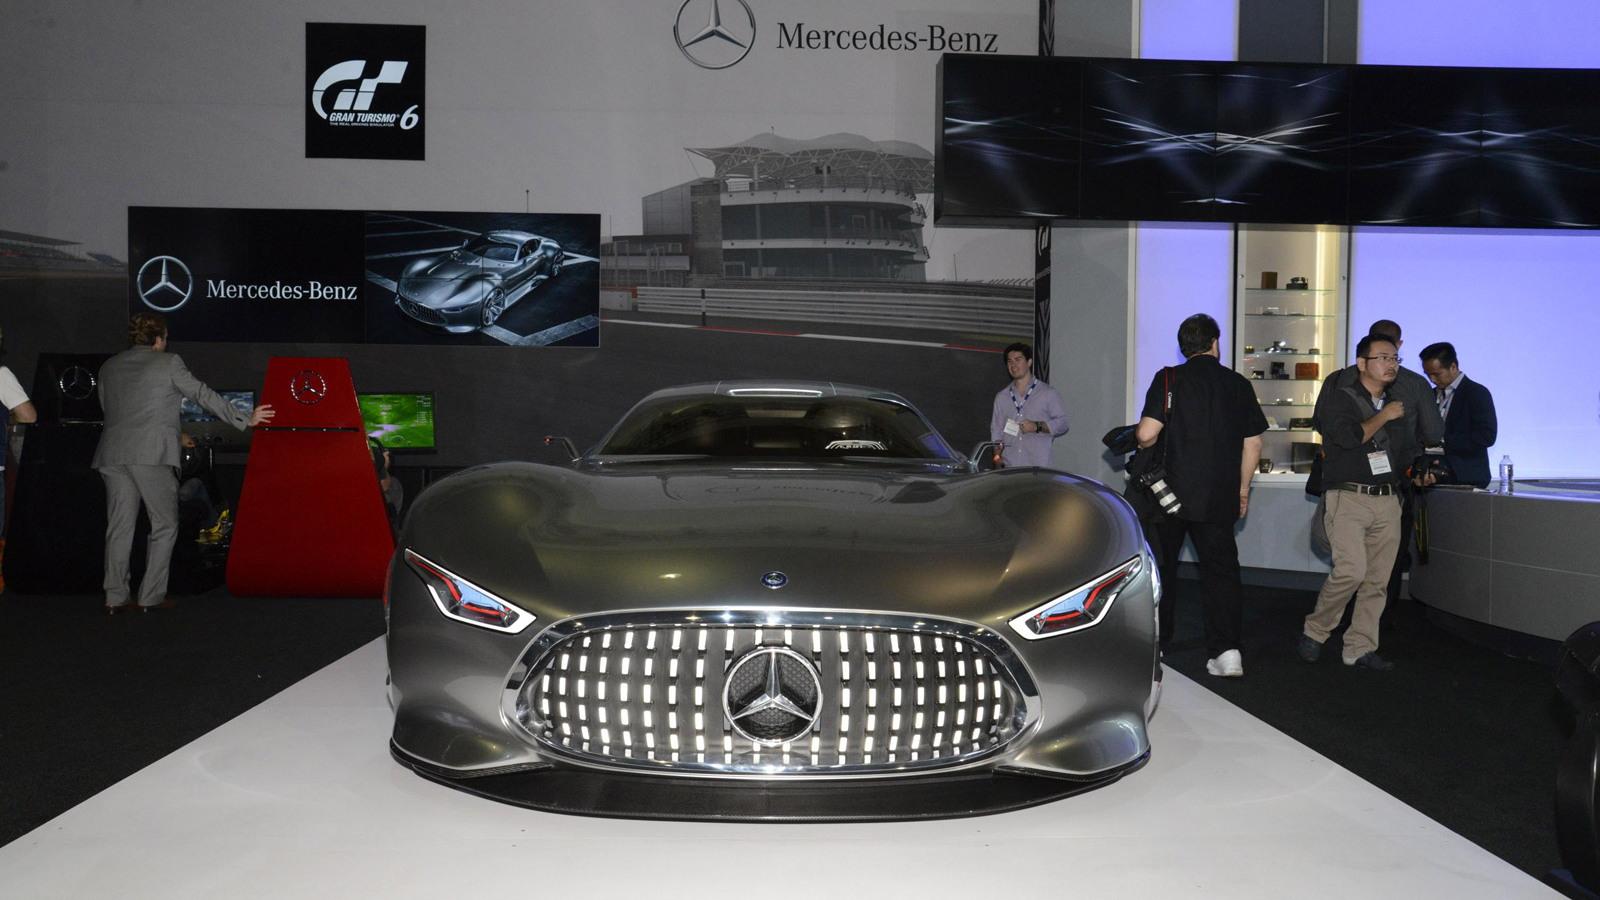 Mercedes-Benz AMG Vision Gran Turismo concept, 2013 Los Angeles Auto Show